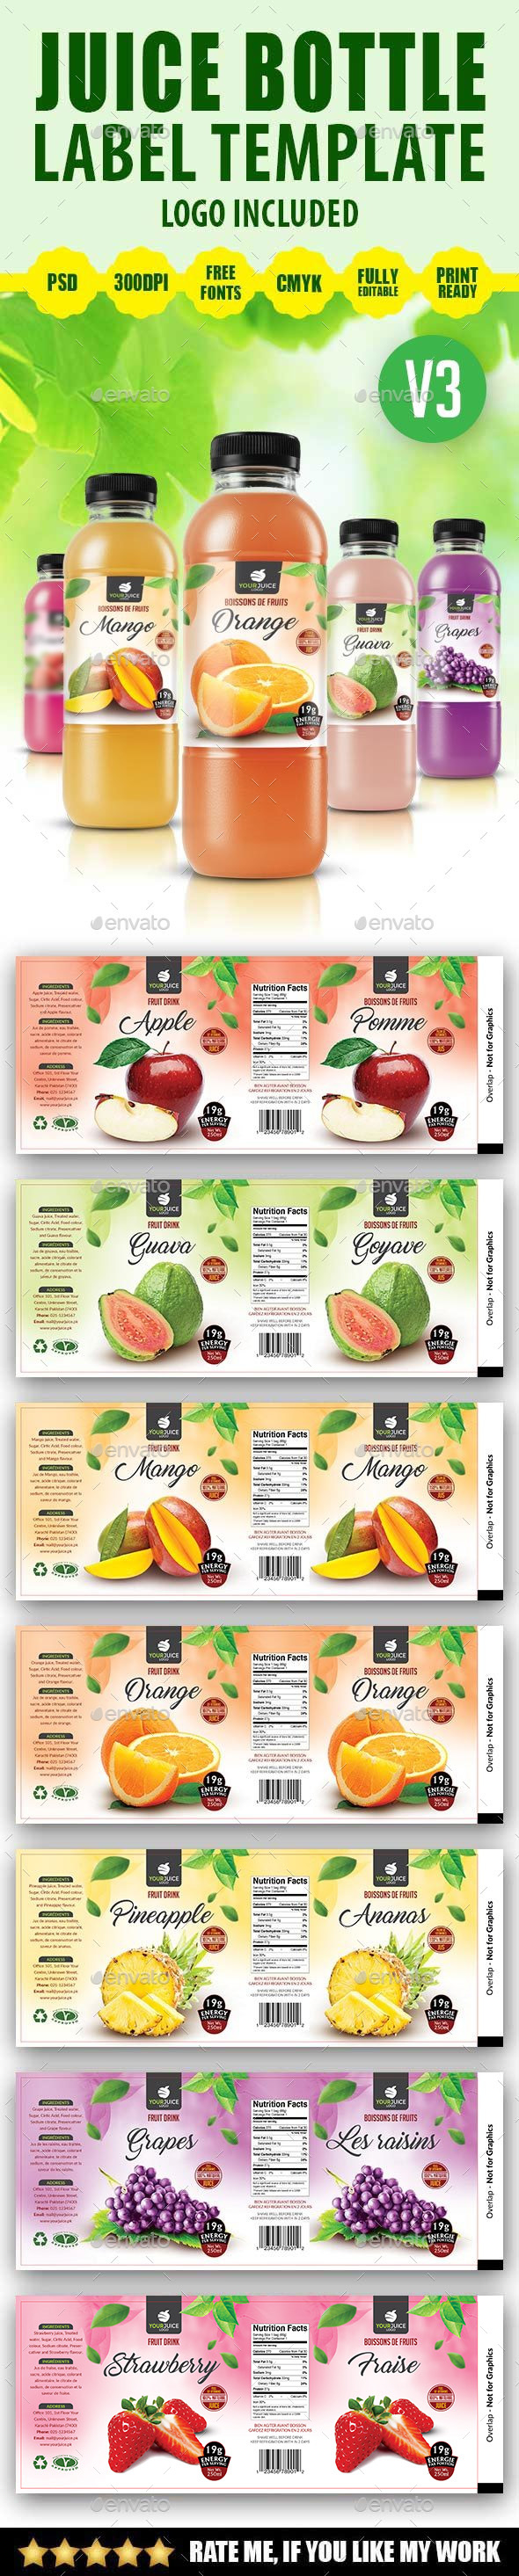 Juice Bottle Label Template V3 - Packaging Print Templates